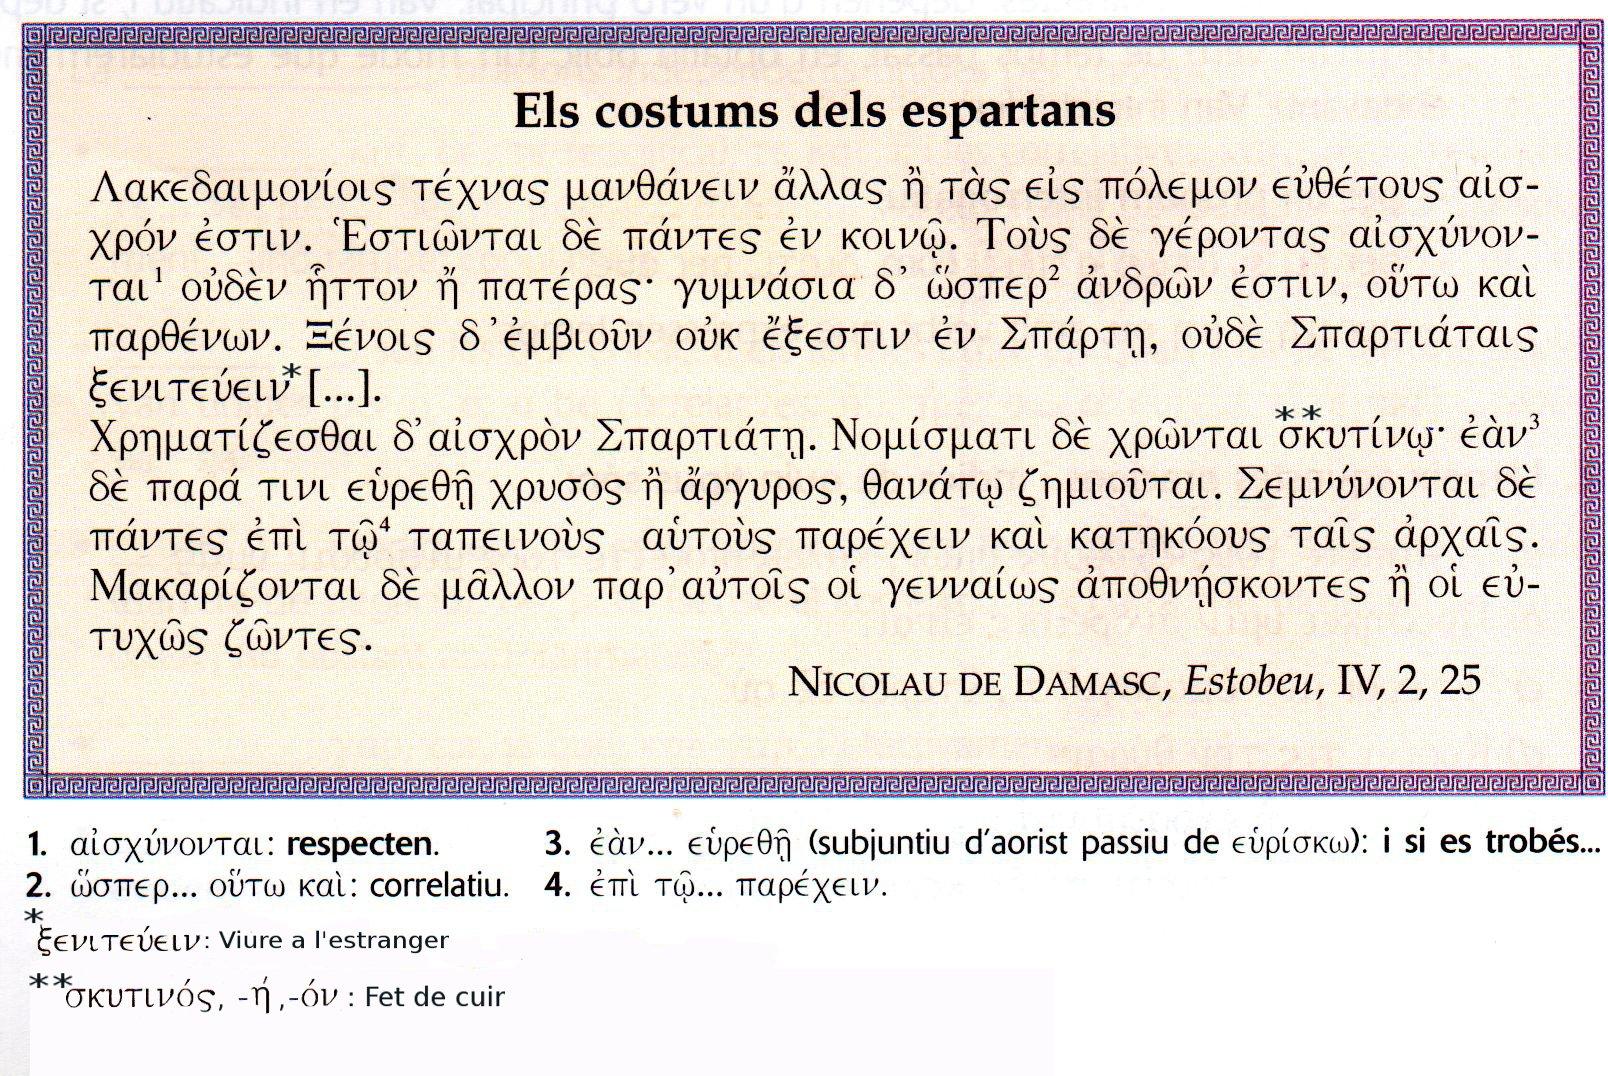 text a traduir